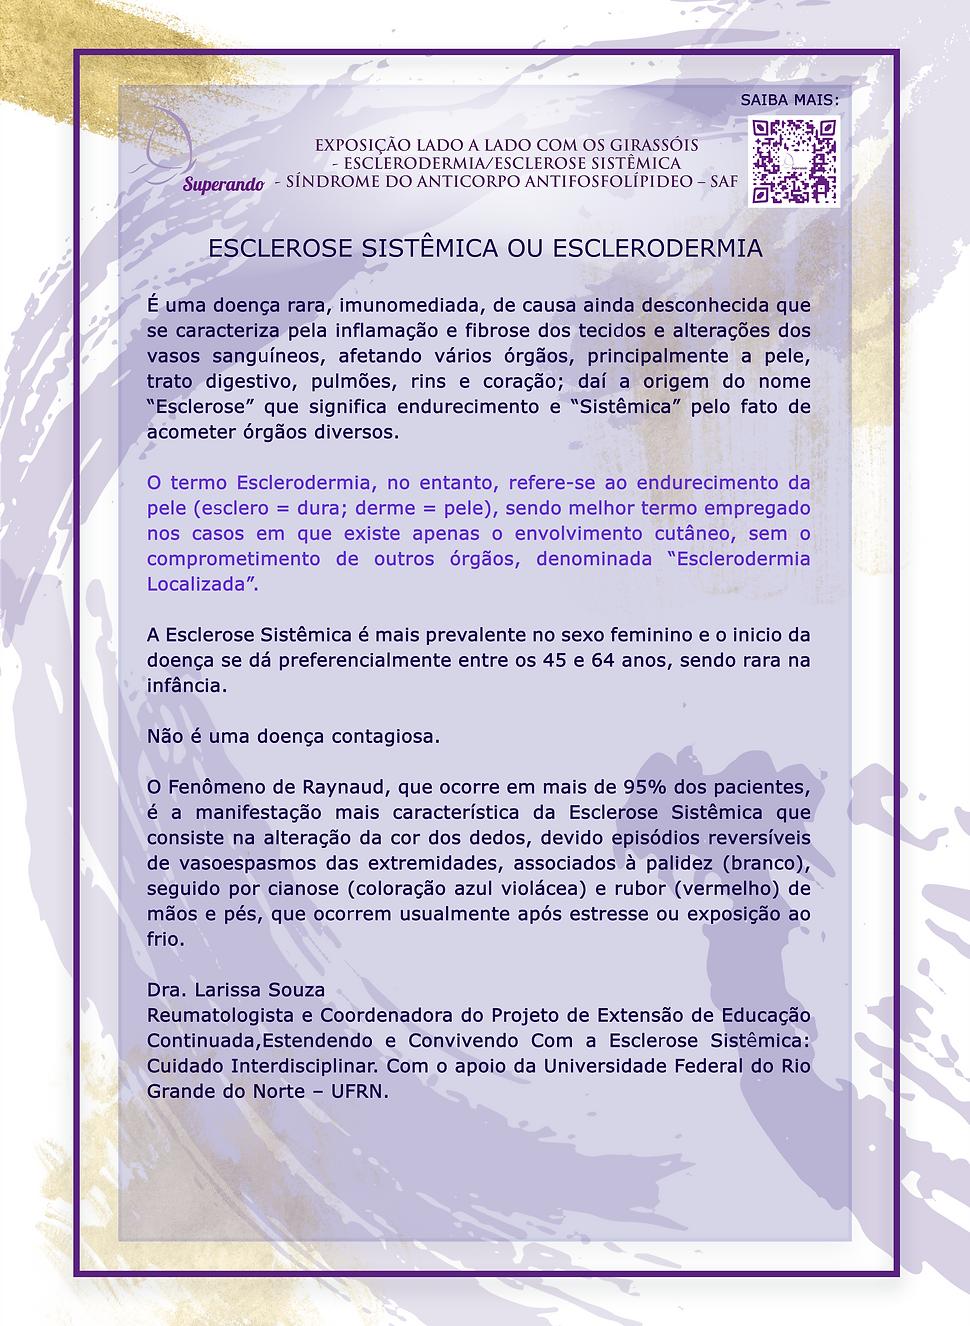 1CARTAZ 03 – ESCLEROSE SISTÊMICA OU ESCL